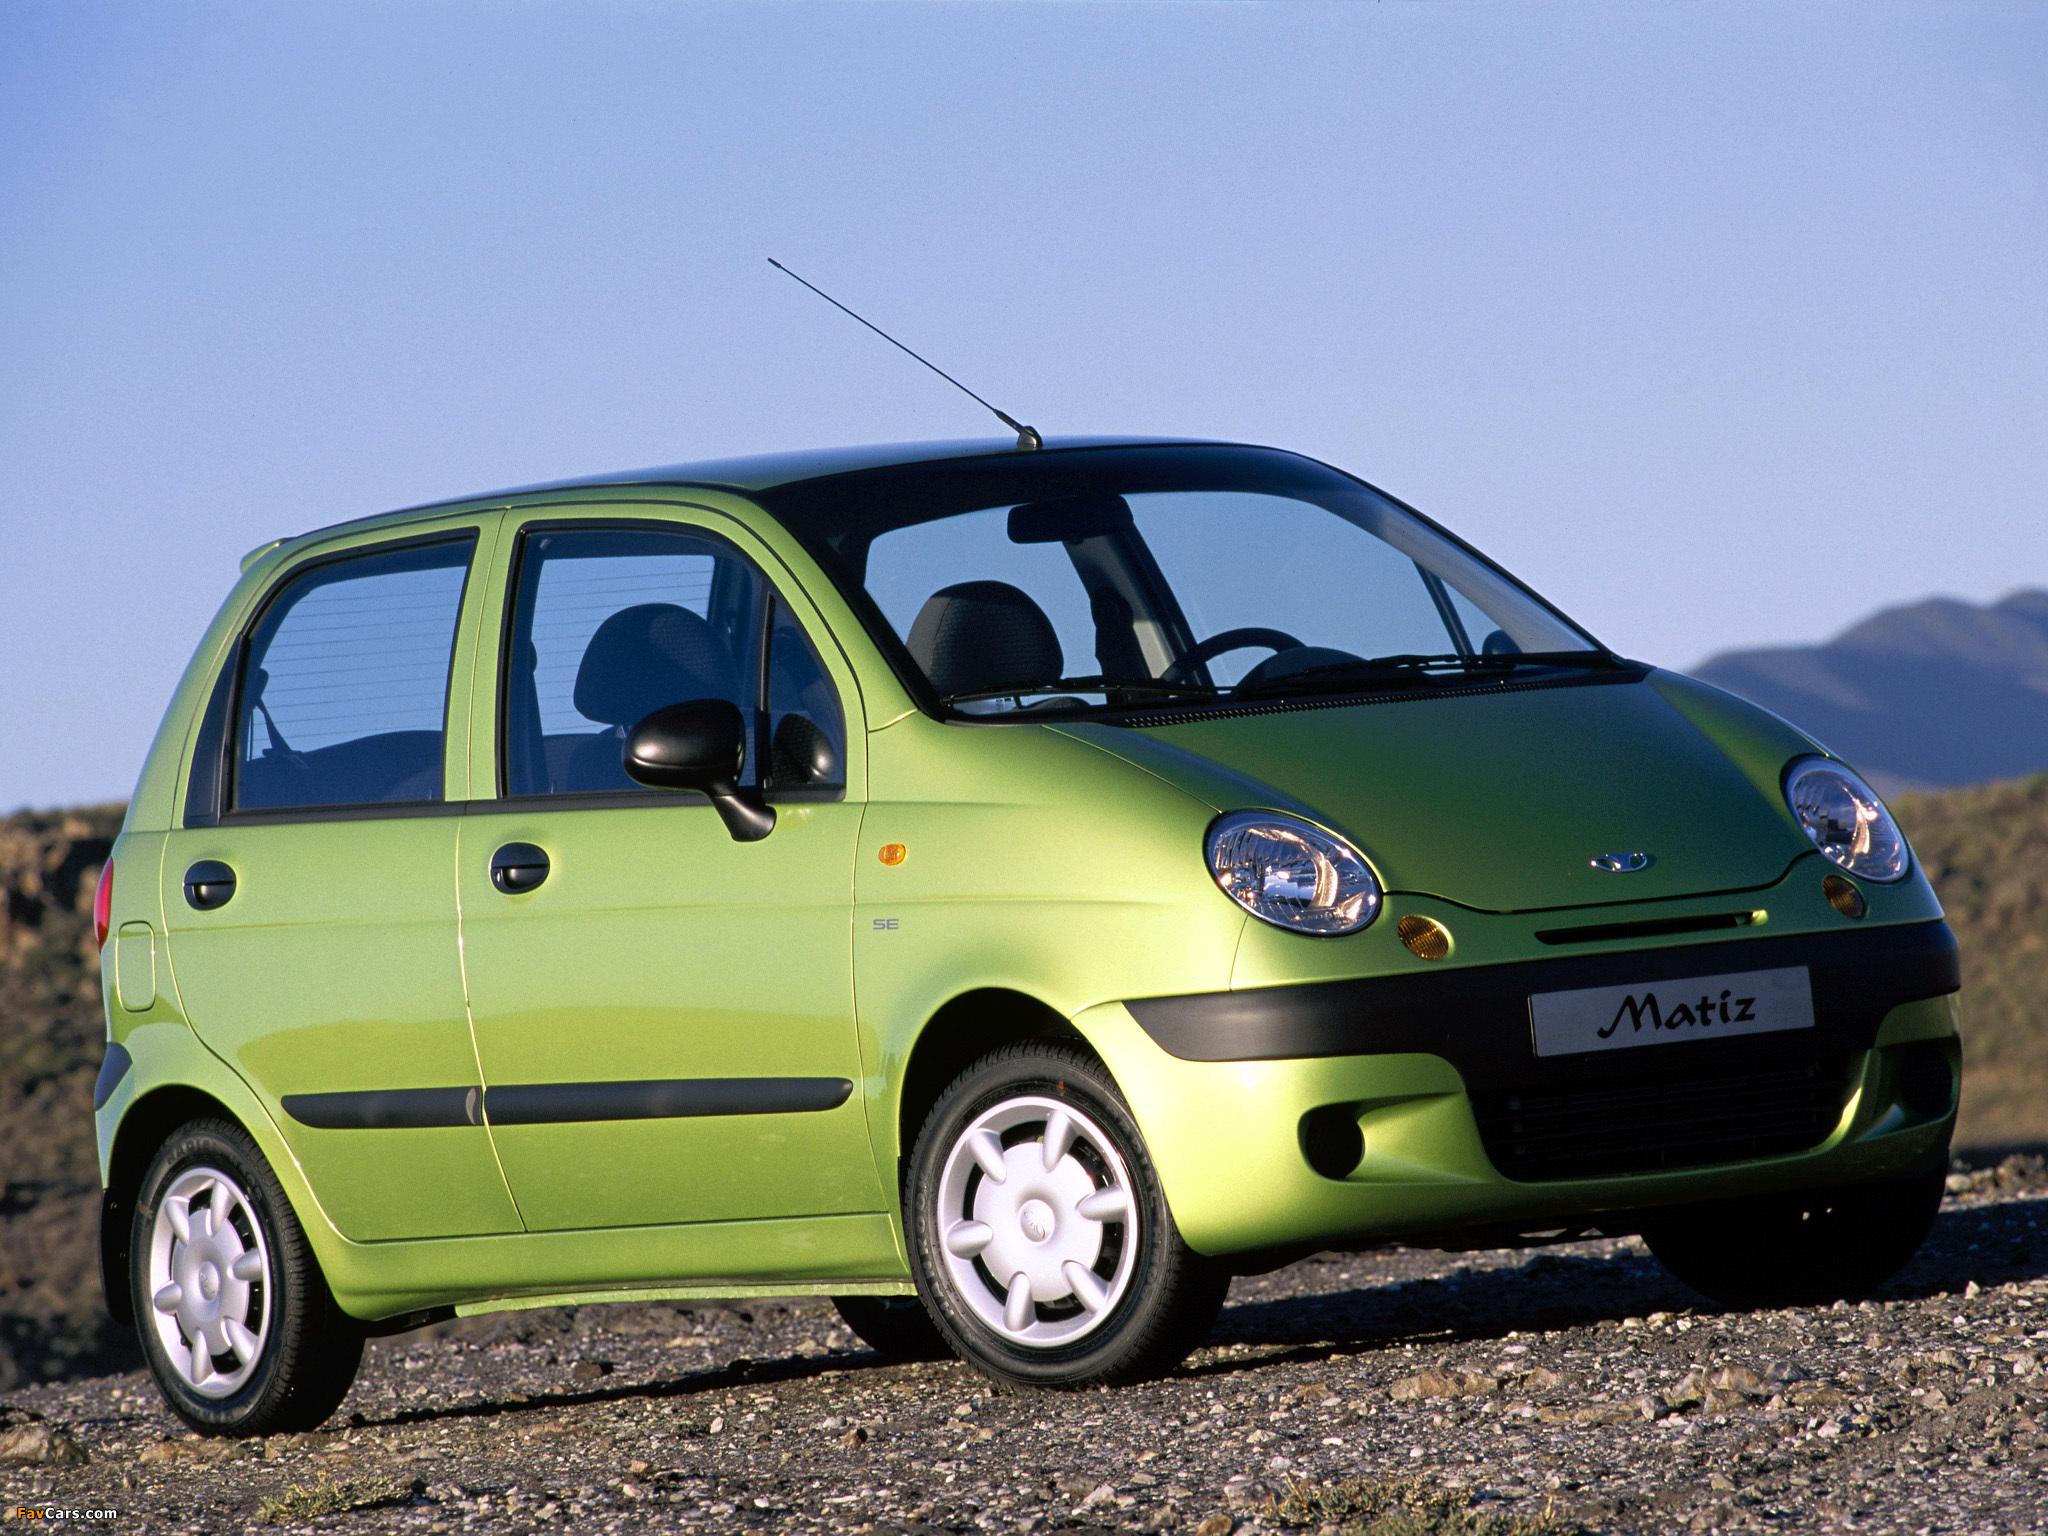 daewoo-matiz-2000-1-facelift-2000.jpg